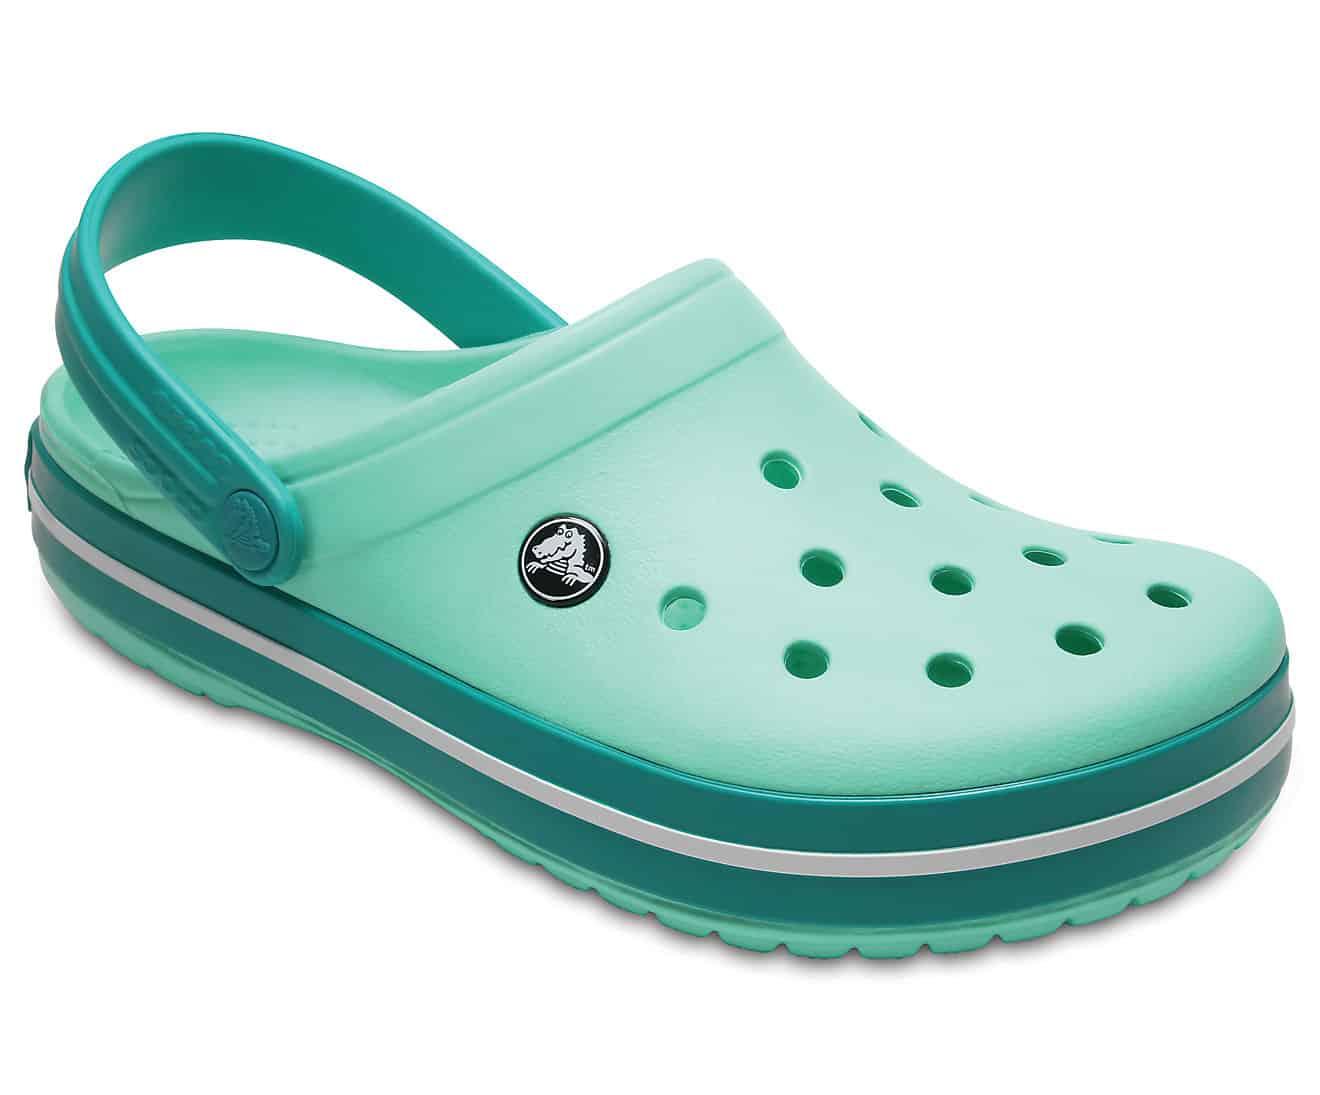 Crocs Crocband New Mint Tropical Teal 11016 - 36R